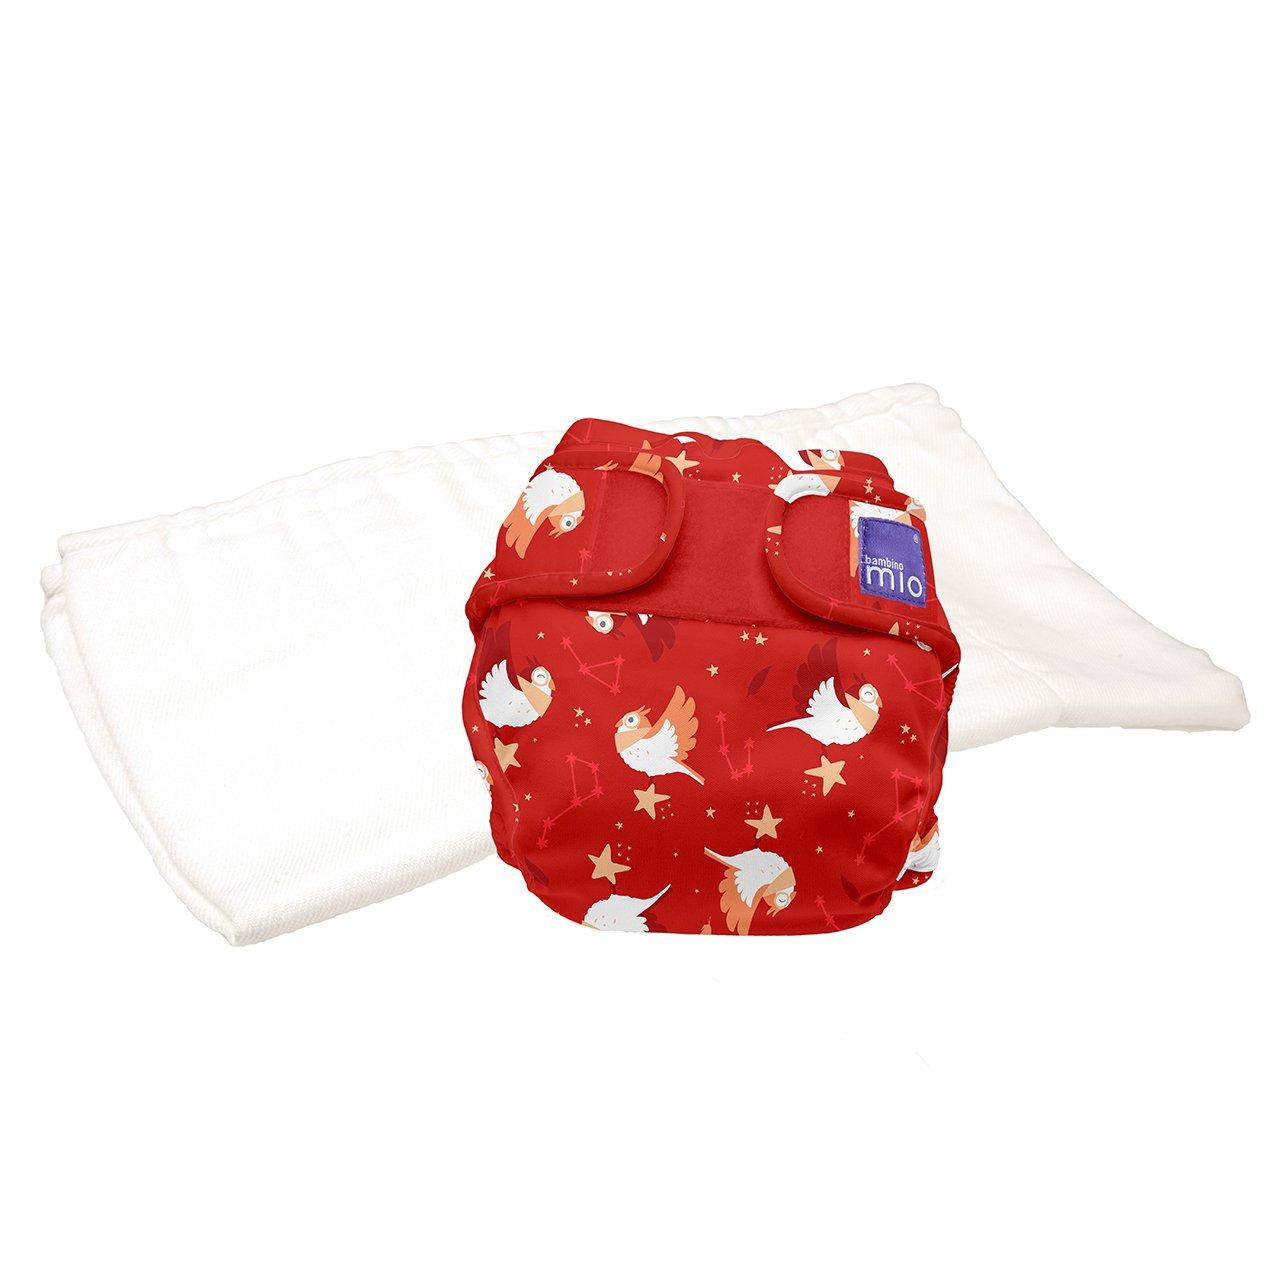 9kgs miosoft two-piece diaper trial pack Bambino Mio cloud nine size 1